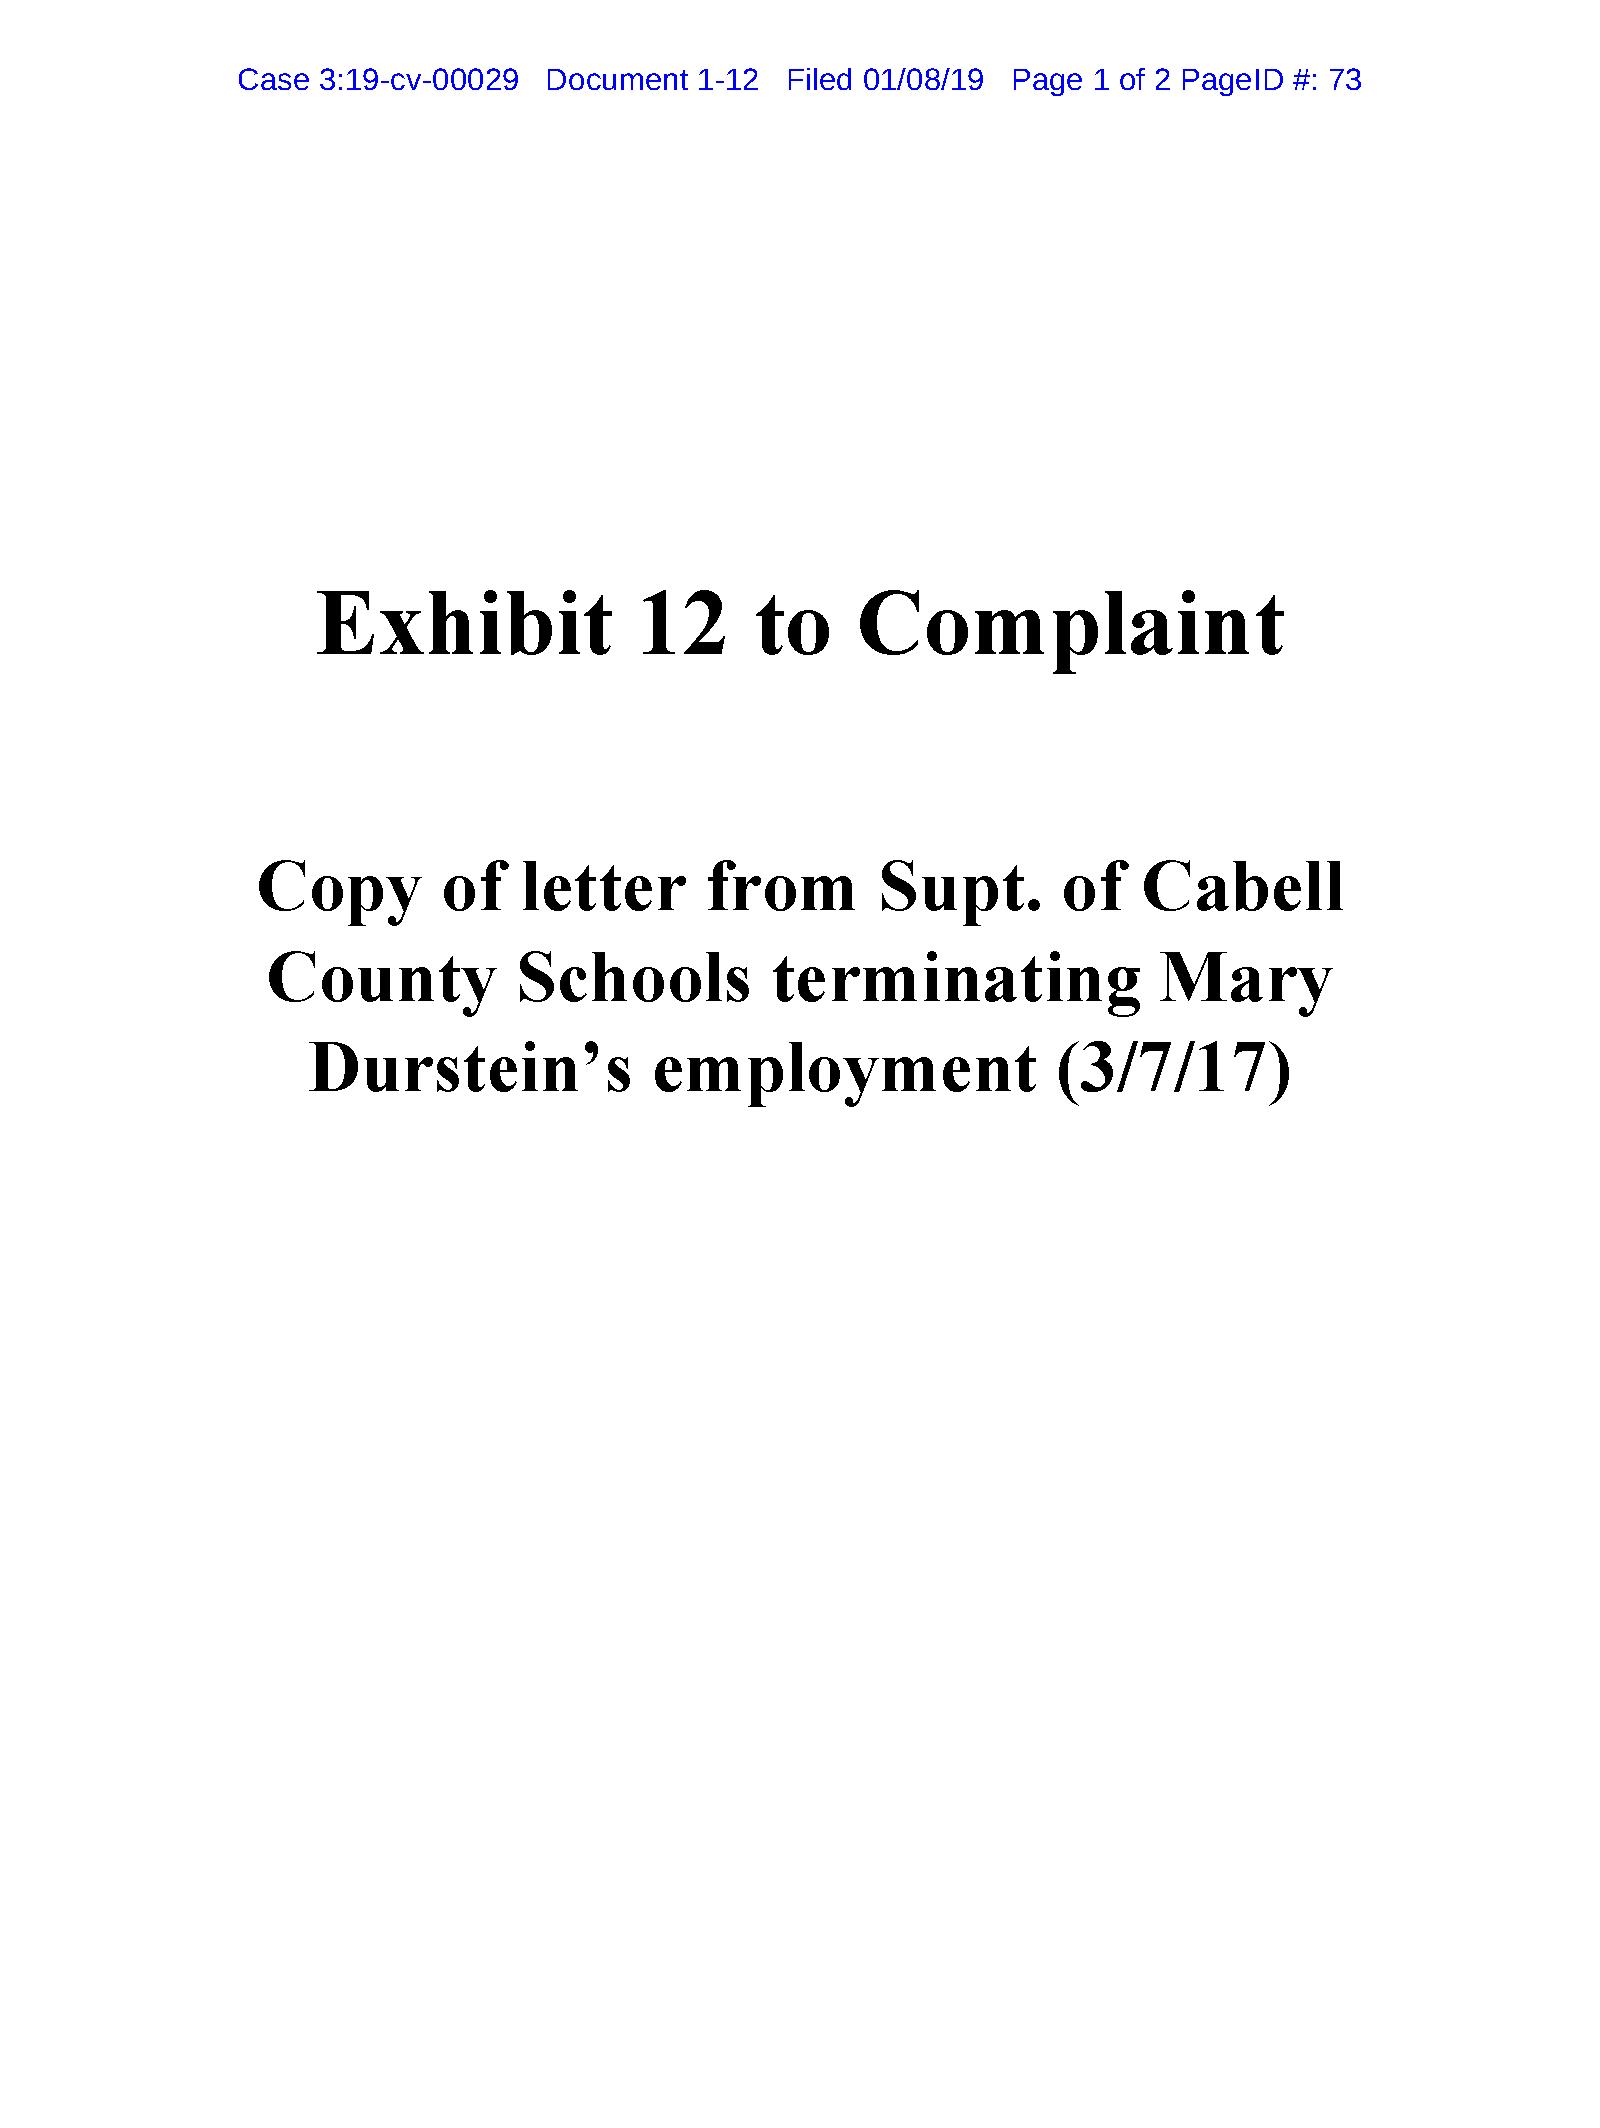 Copy of 2021-03-28_2-06-421.png